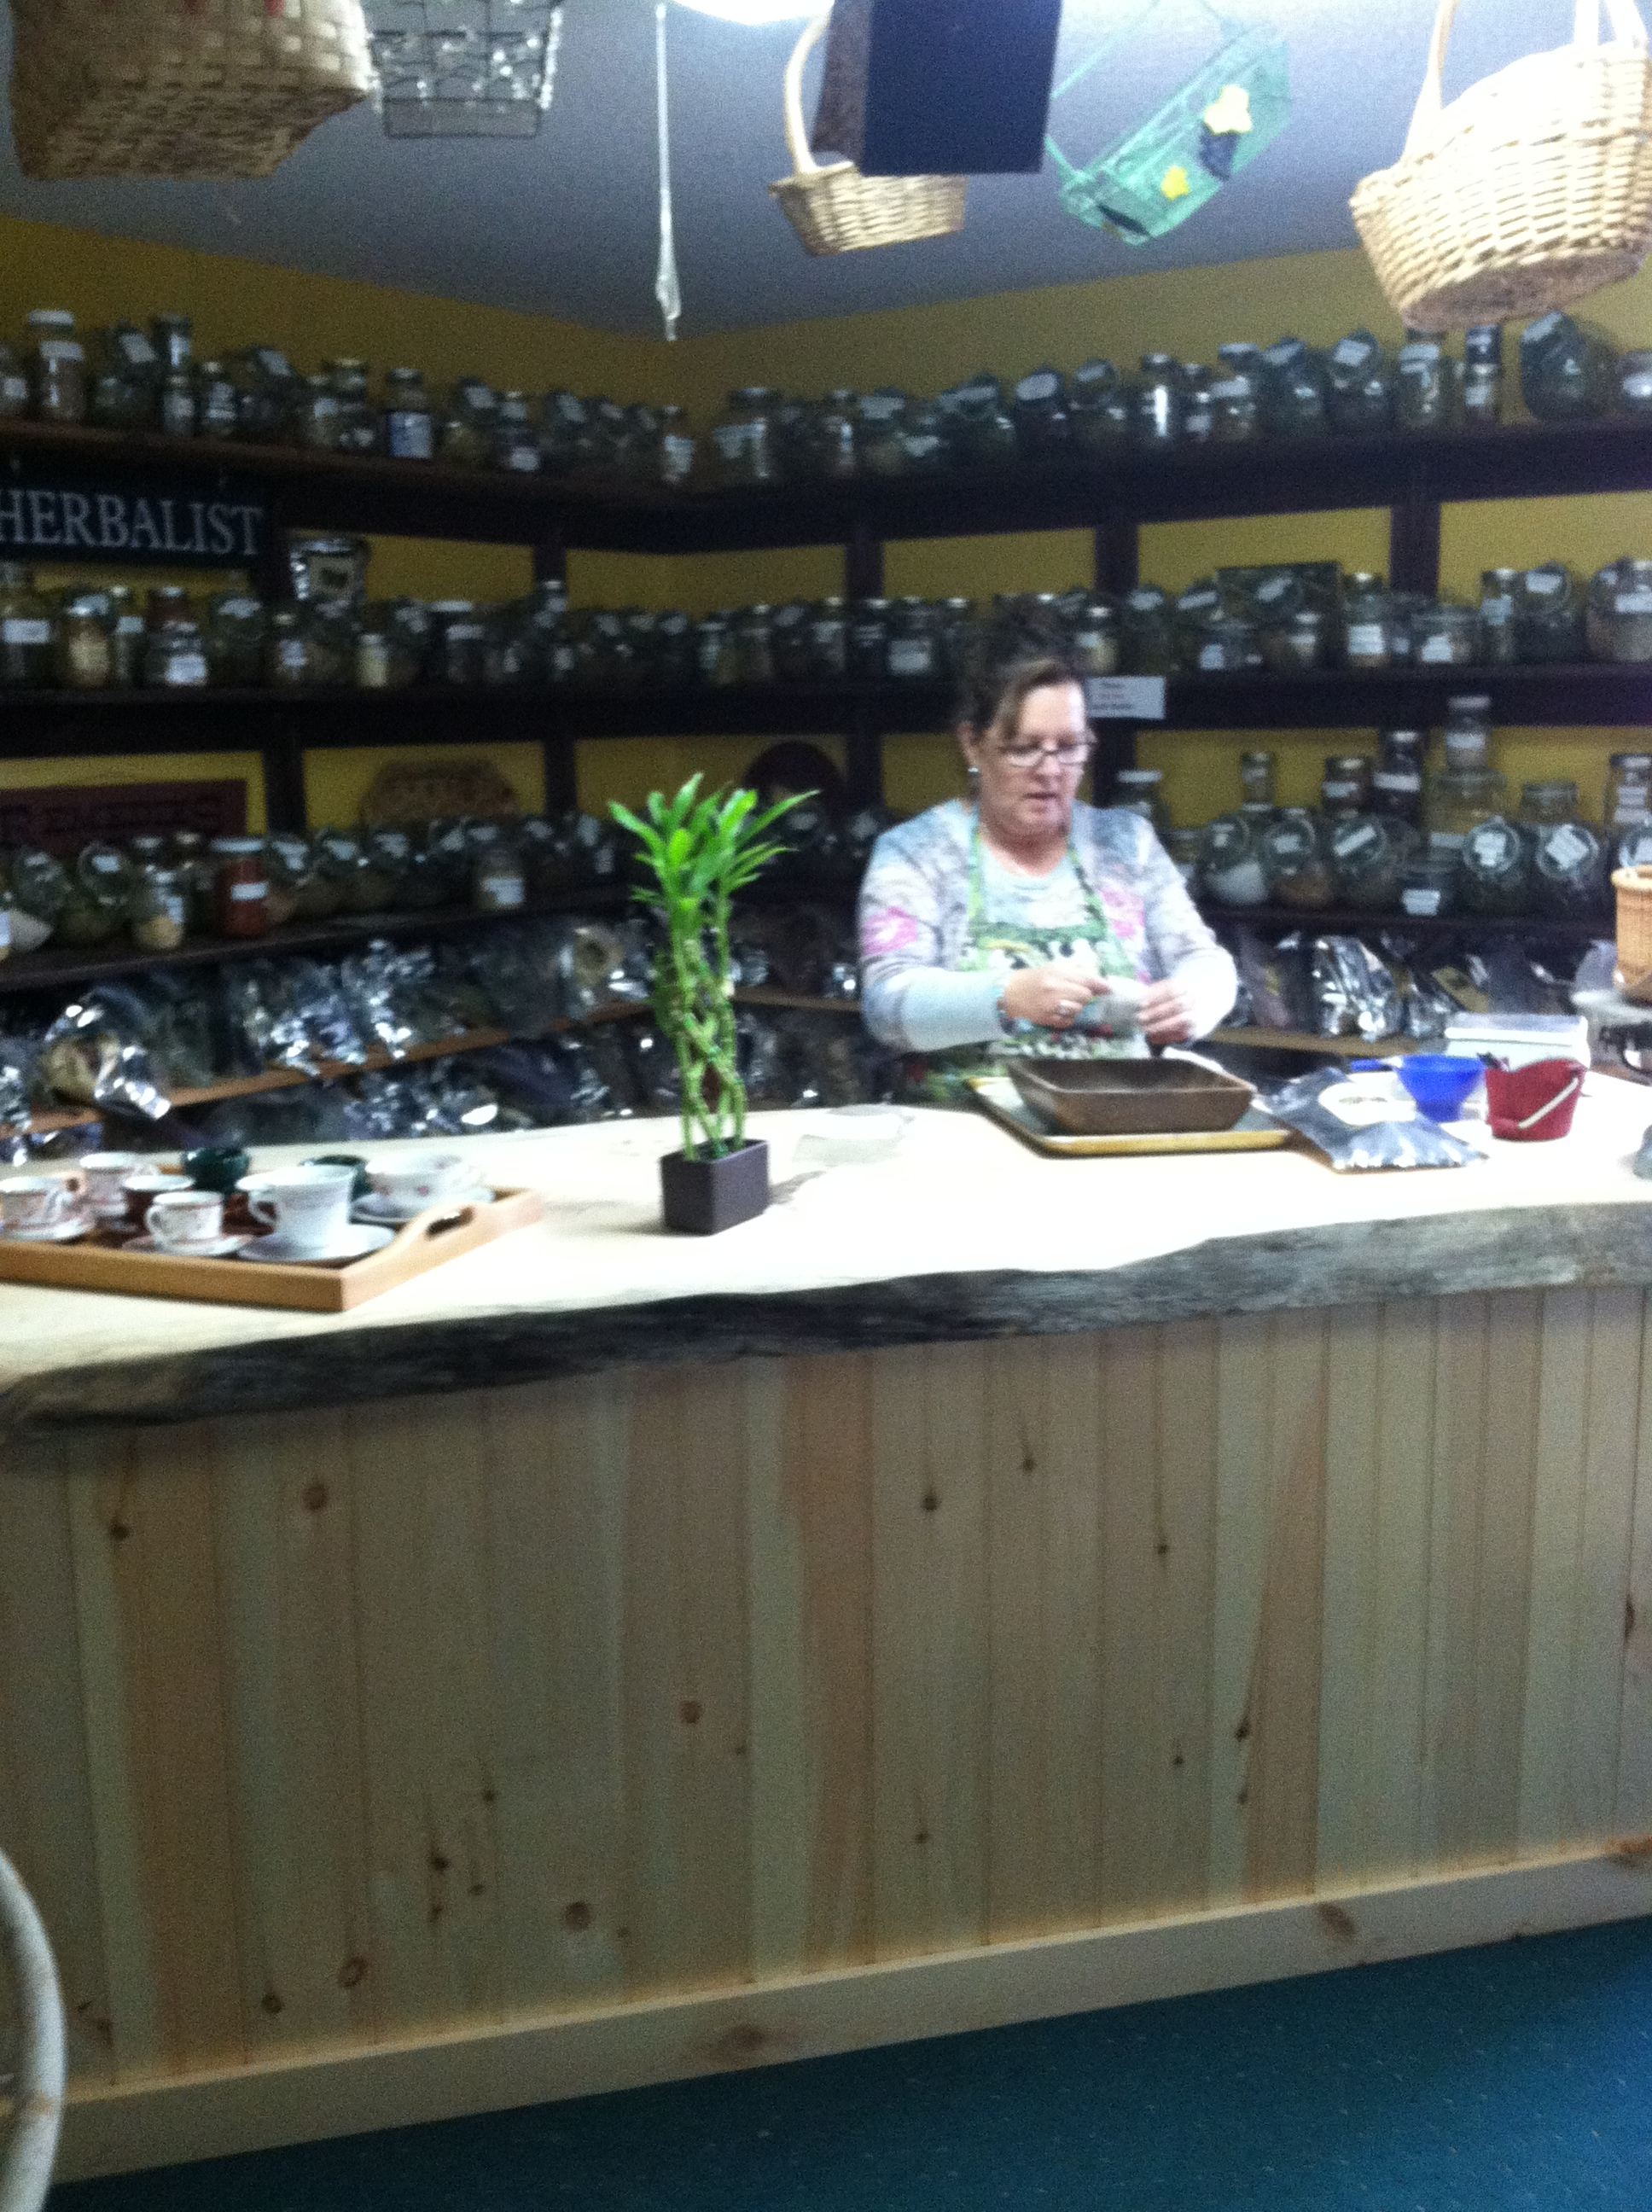 Gail.....Mixing Herbs....